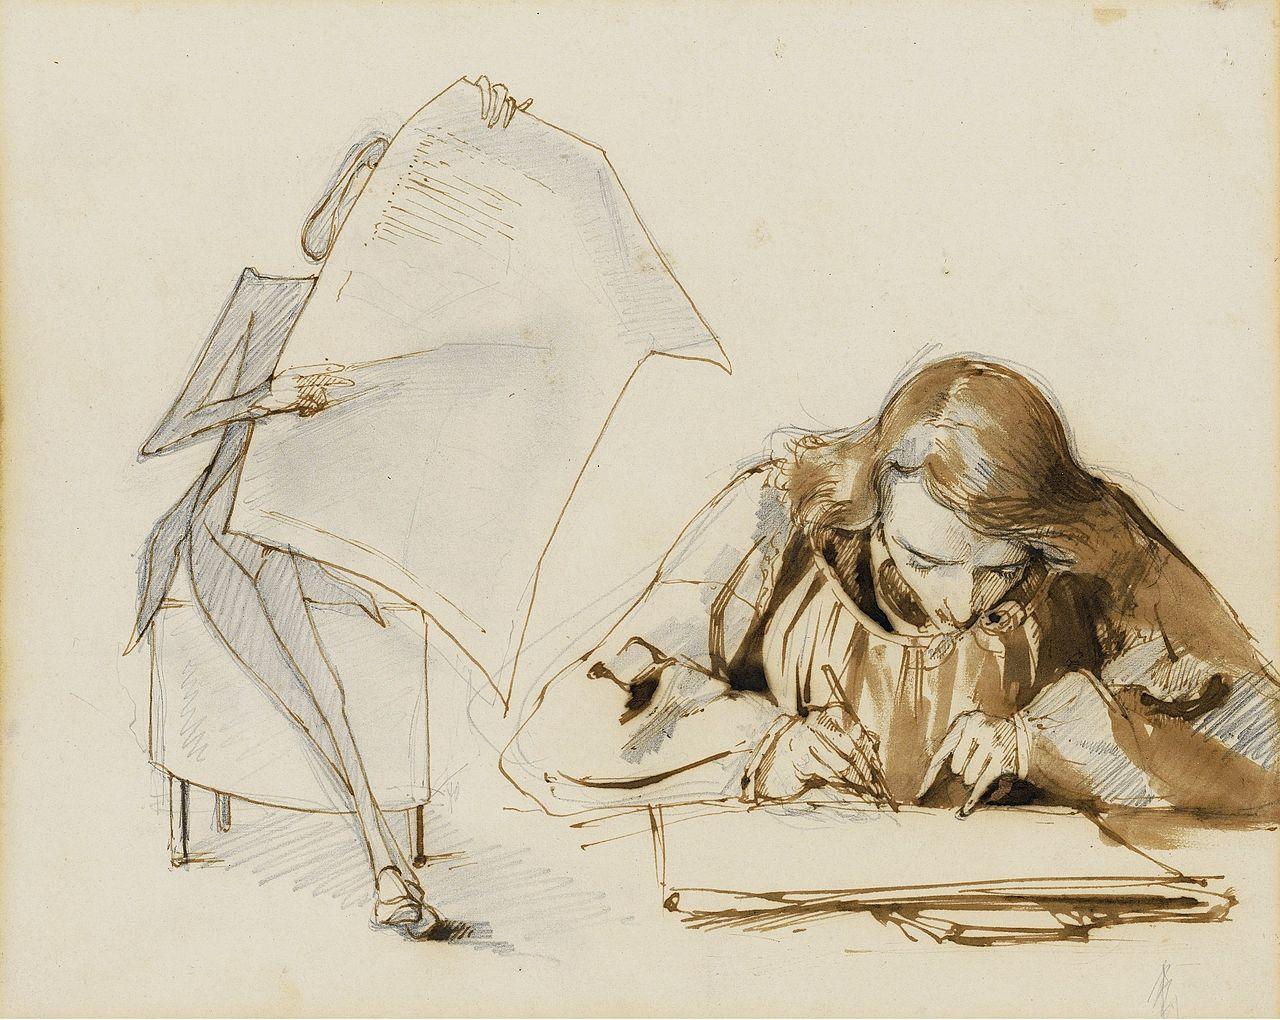 Pauline Viardot-Frédéric-Chopin en train de lire Maurice_Sand dessinant